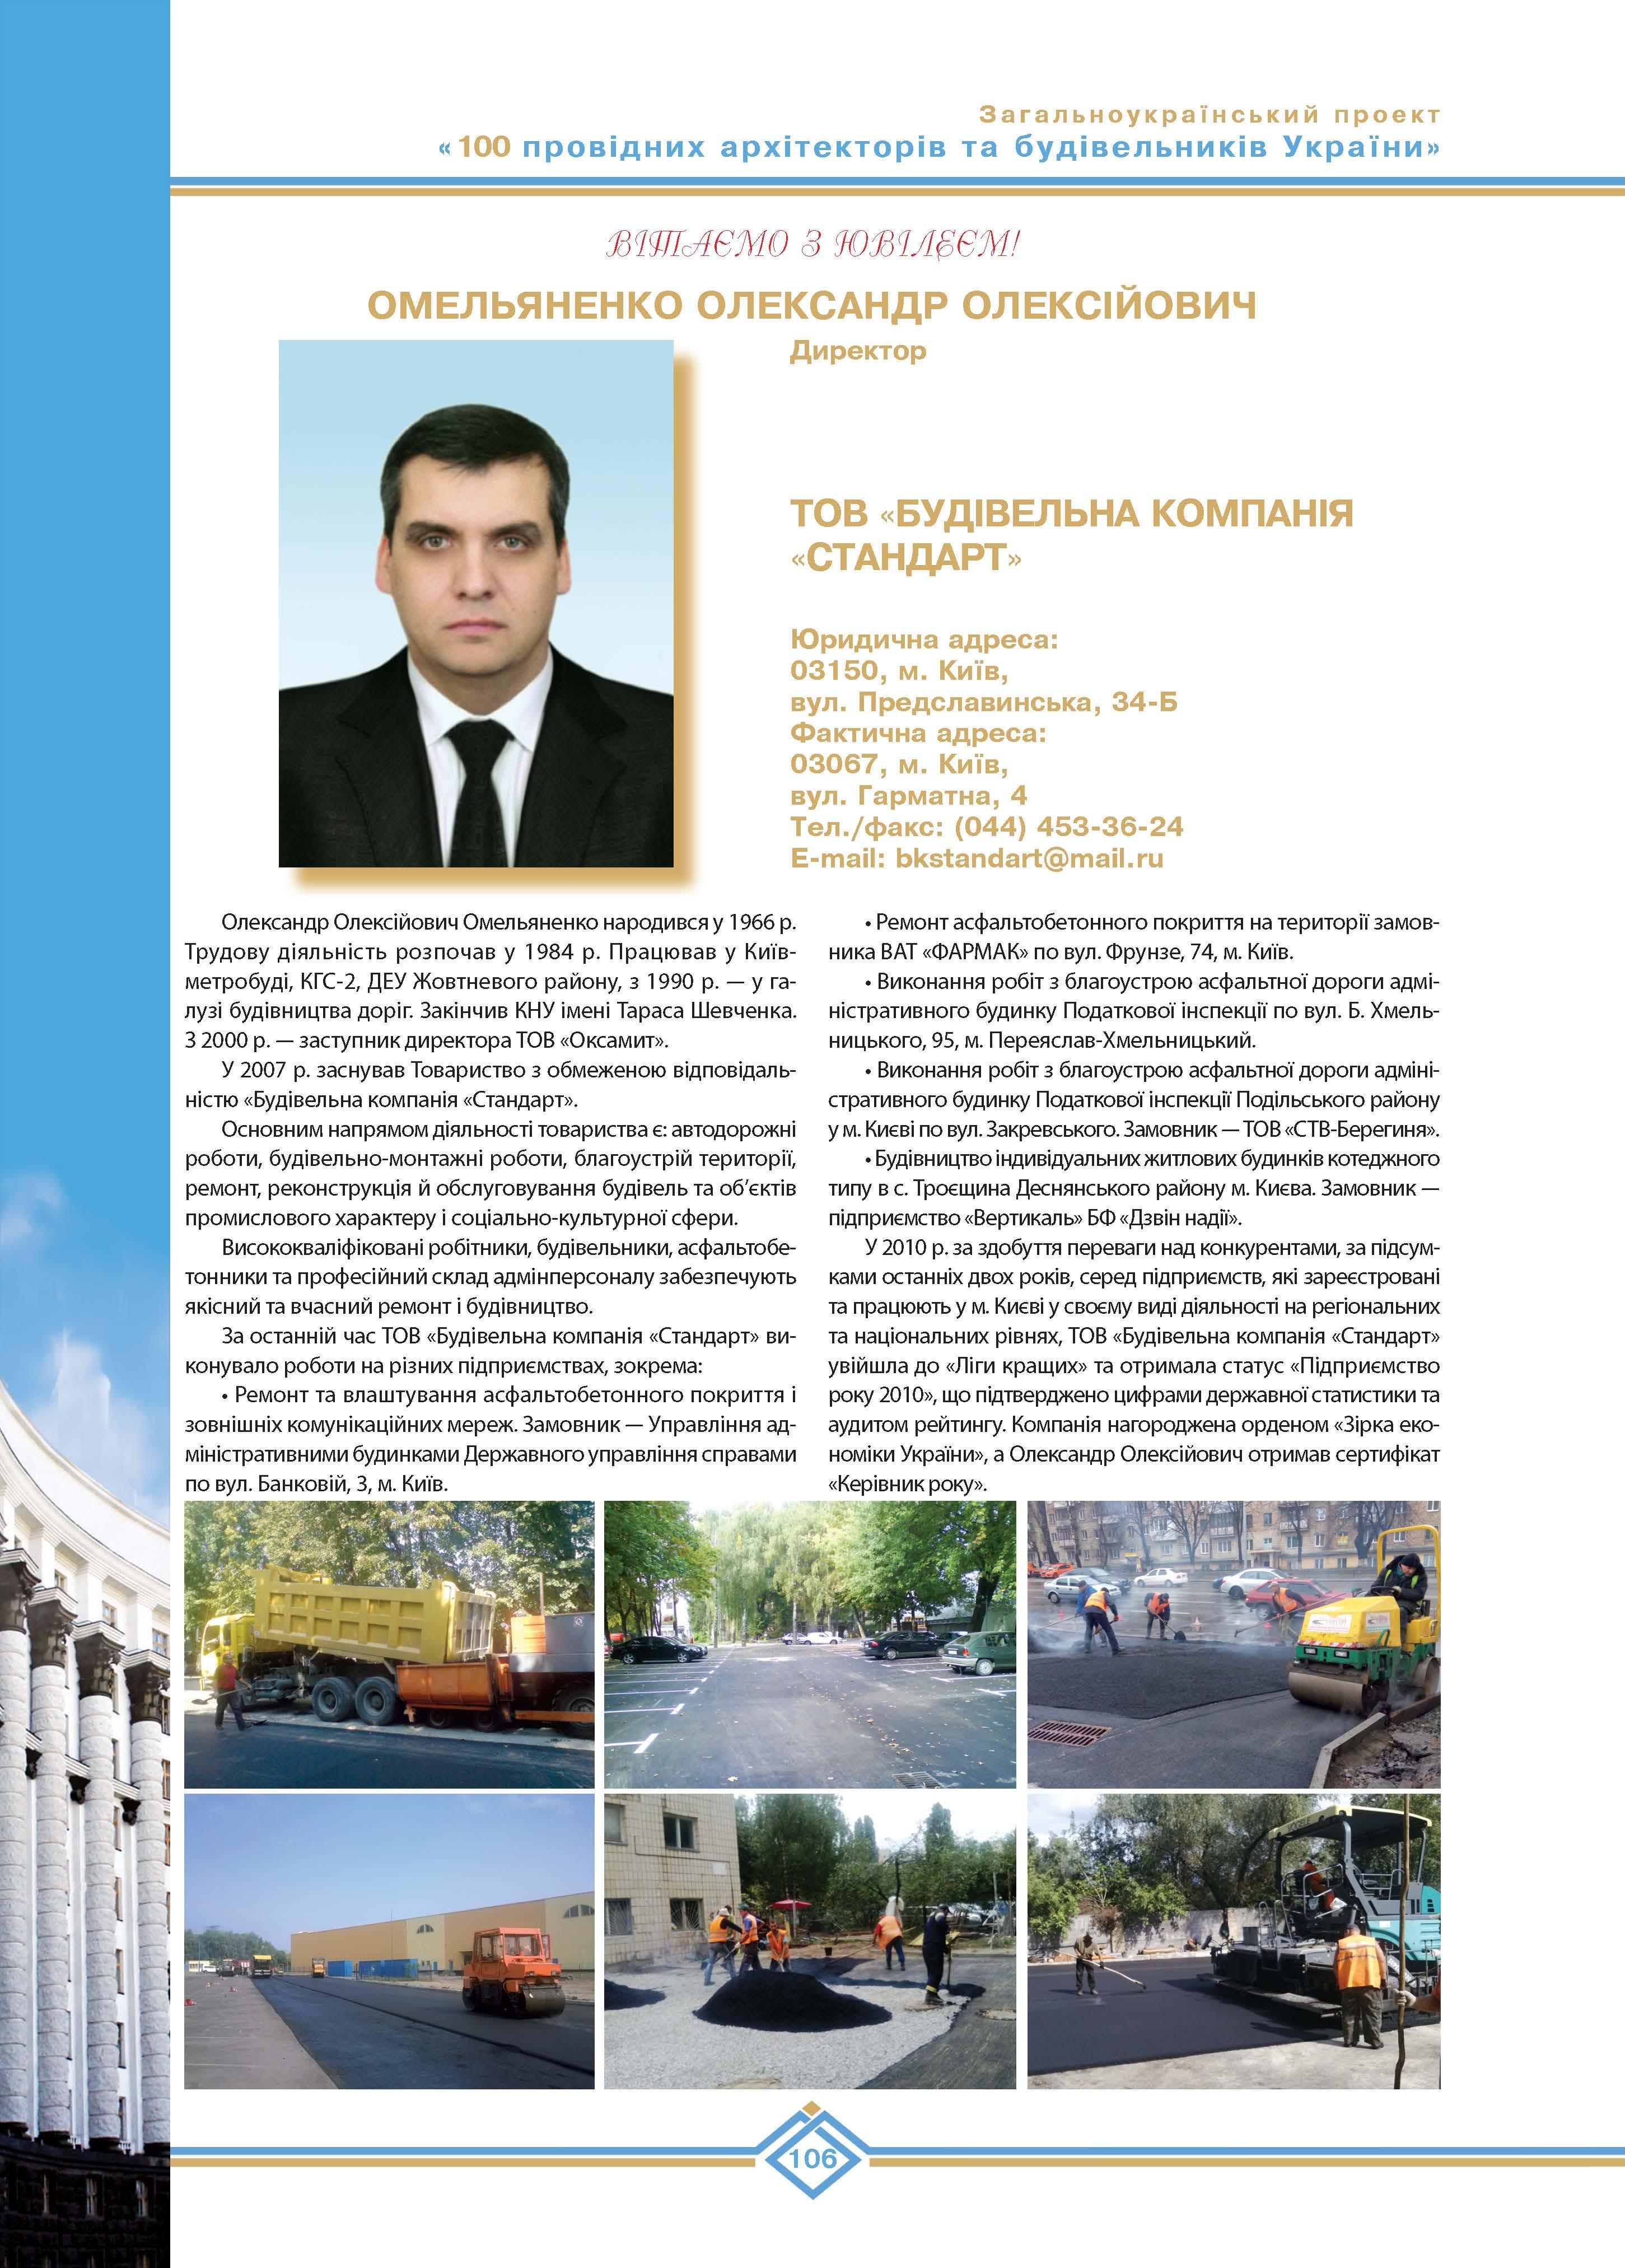 Омельяненко Олександр Олексійович